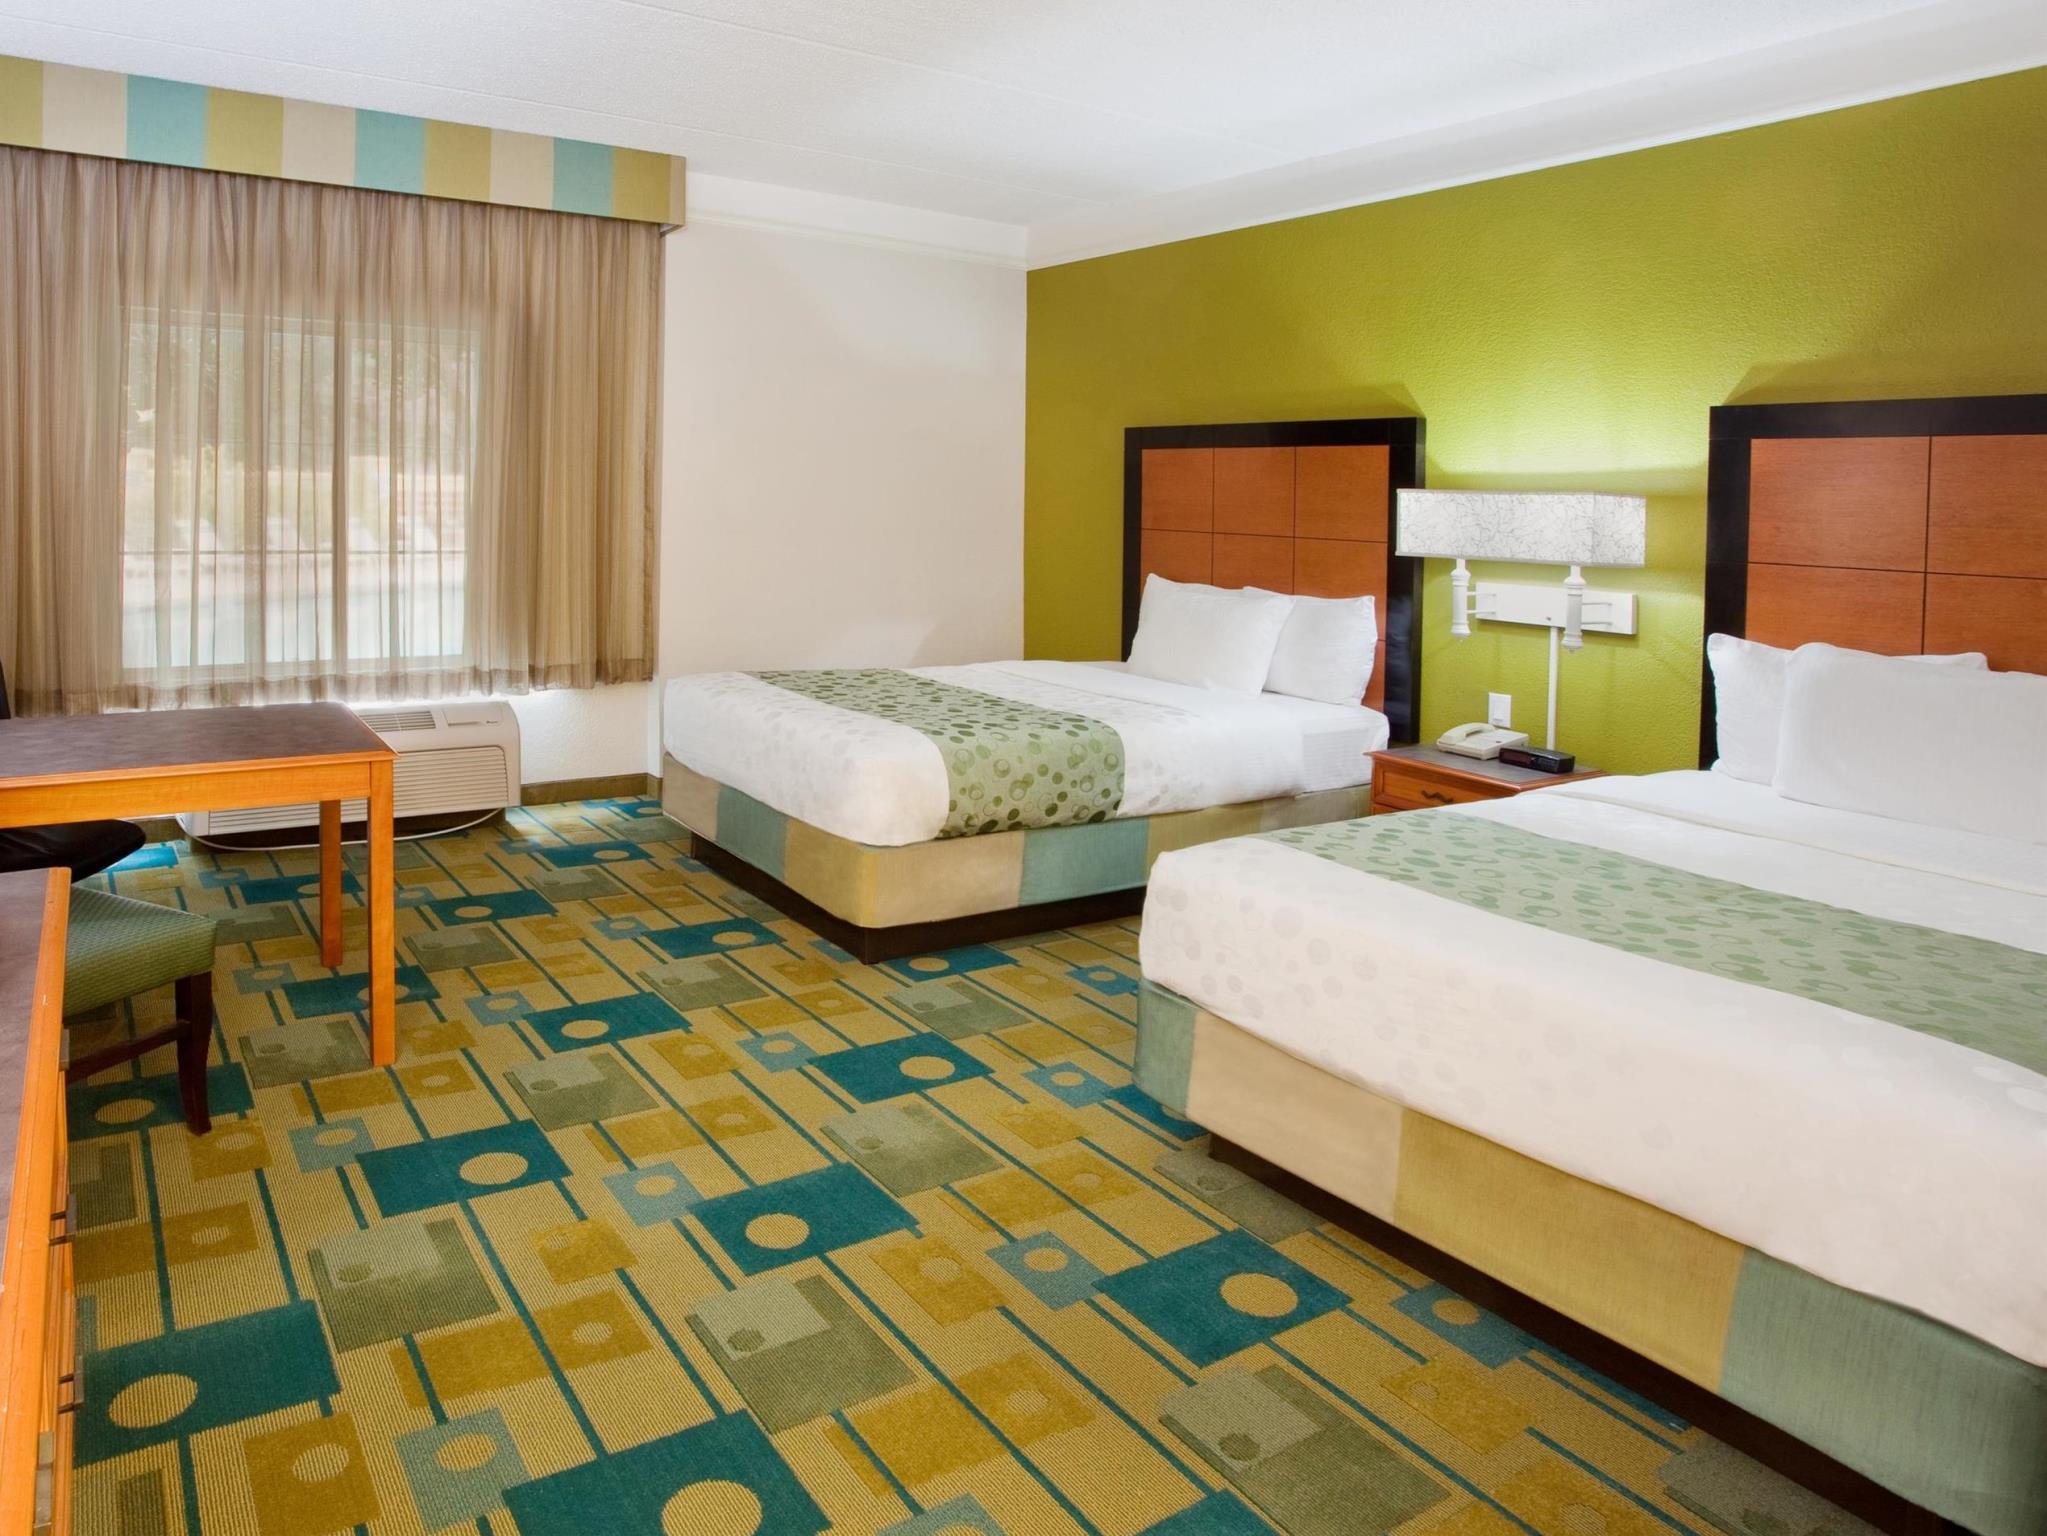 La Quinta Inn & Suites By Wyndham Greenville Haywood